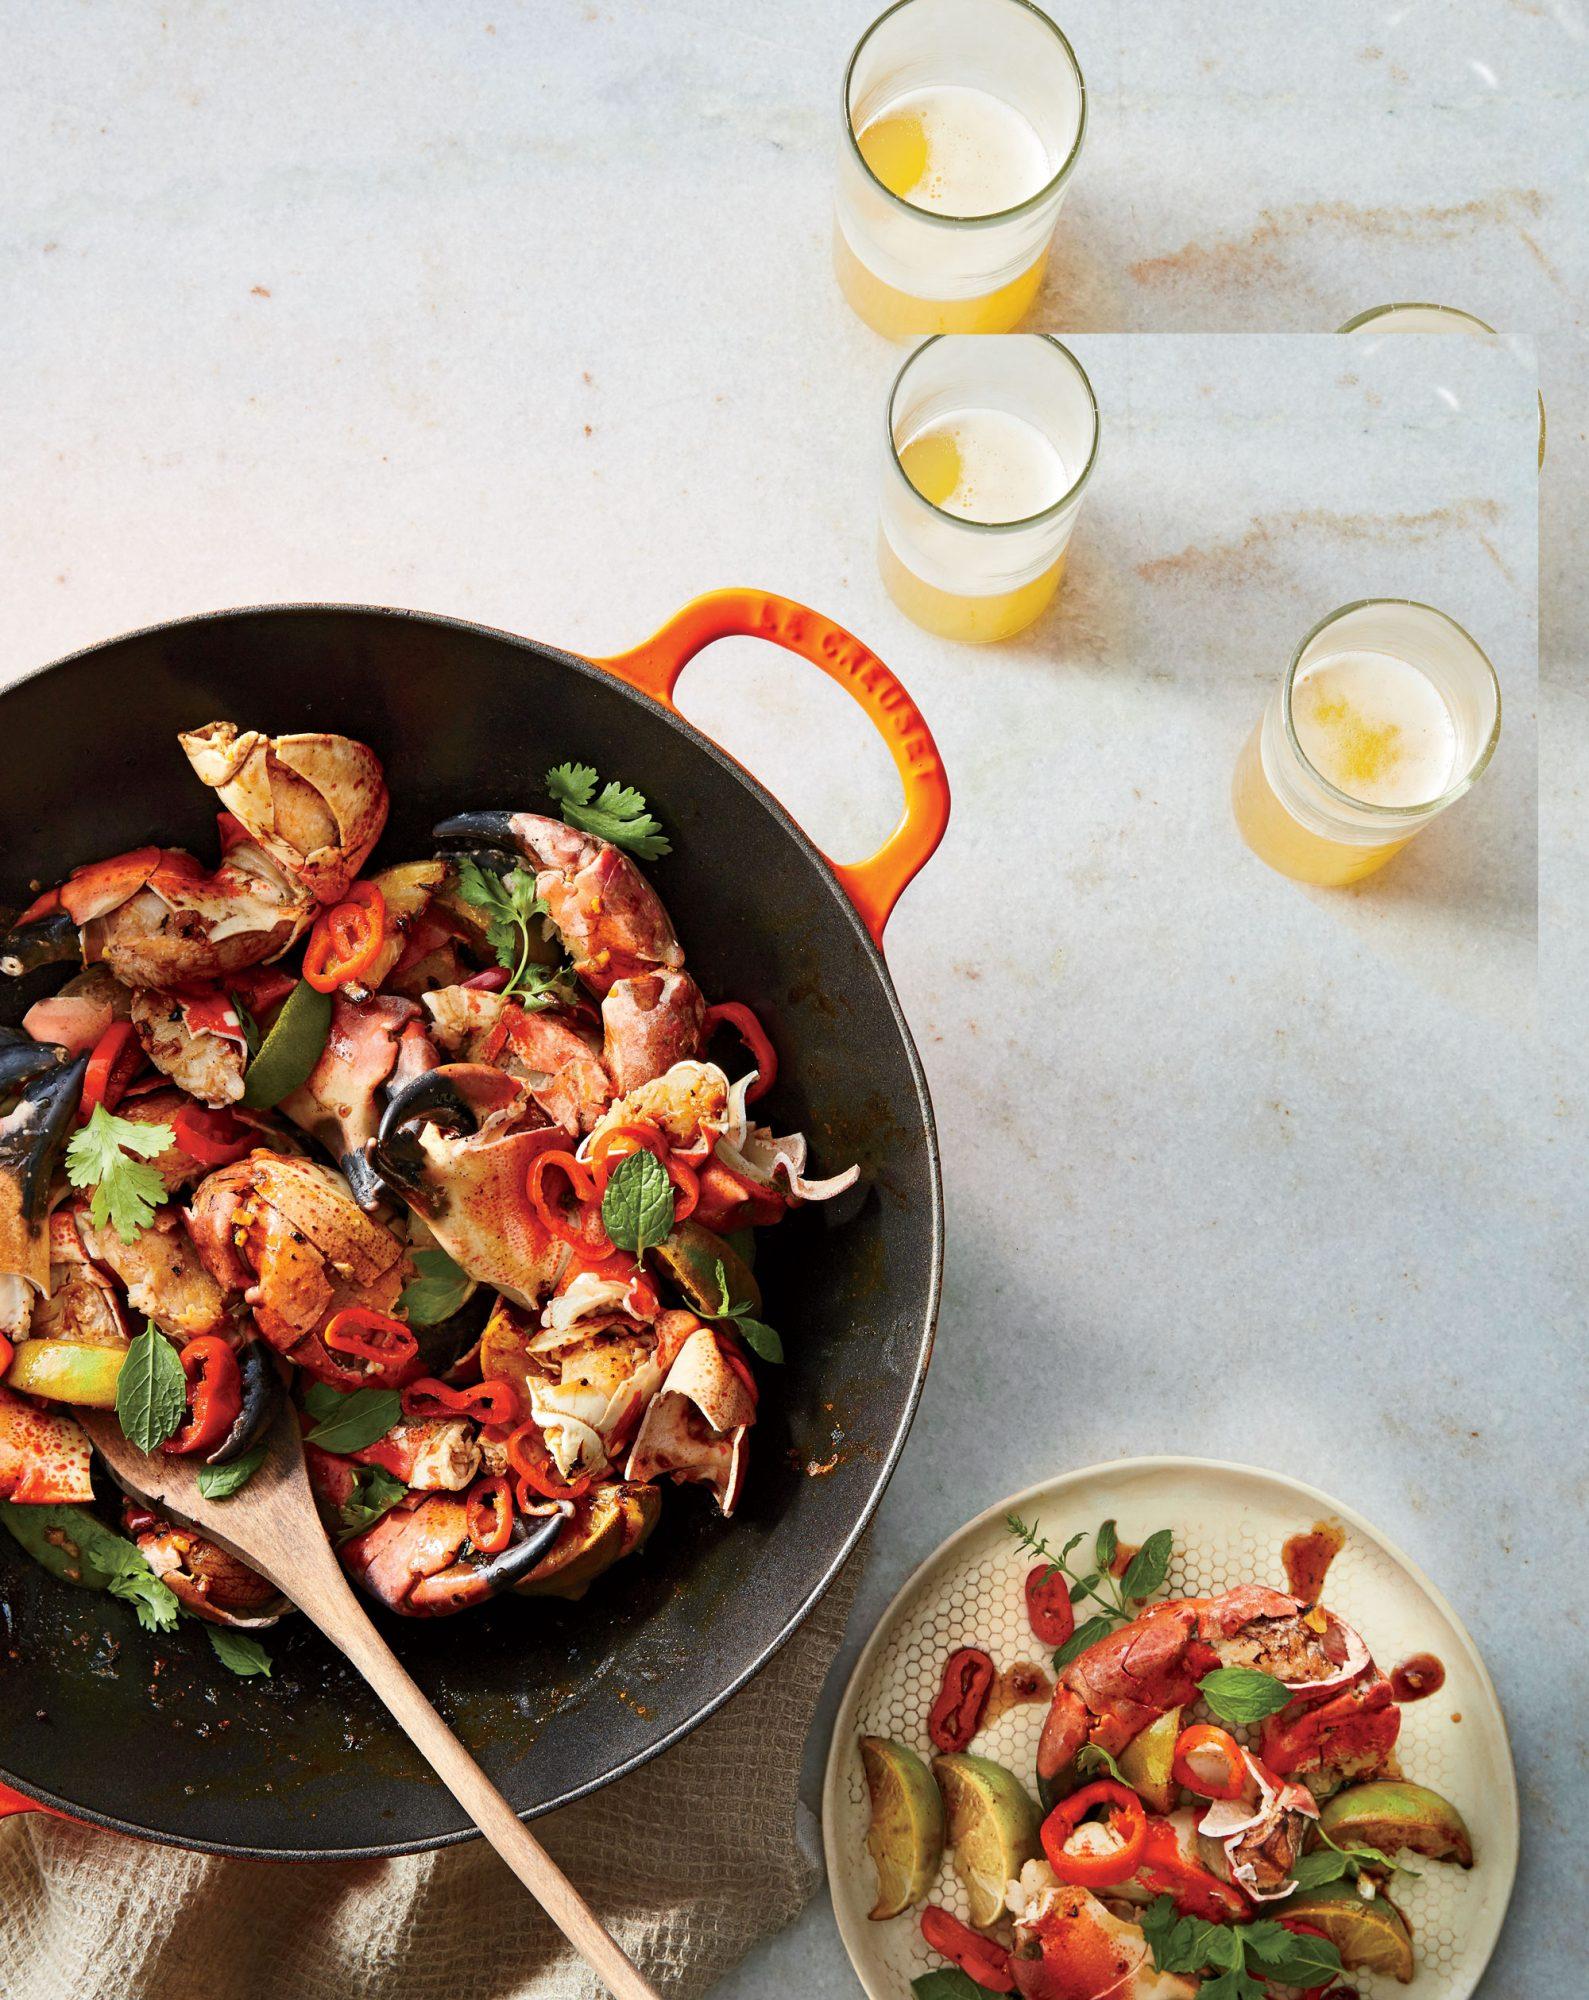 Stone Crab Stir-Fry